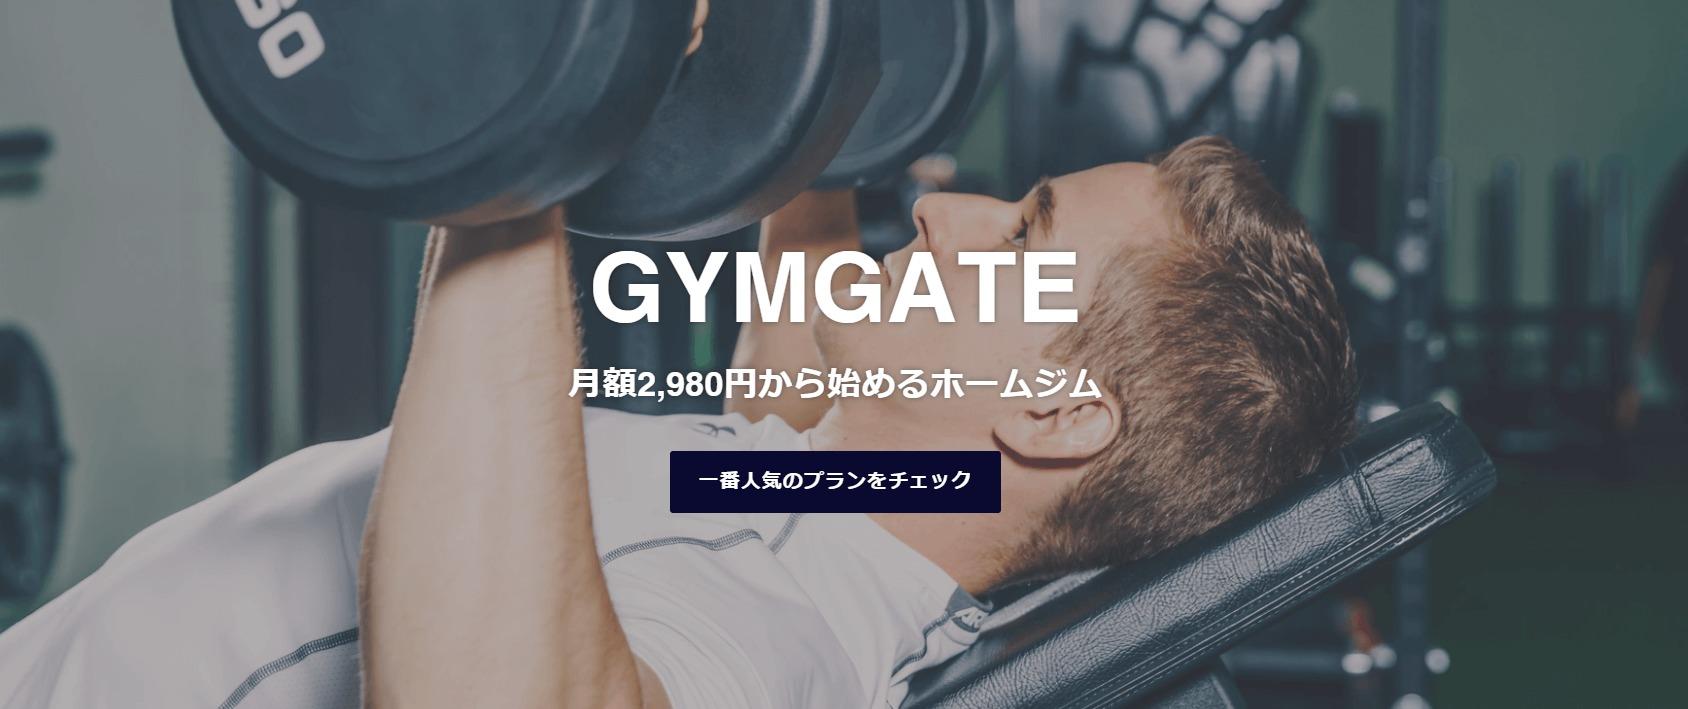 GYMGATE